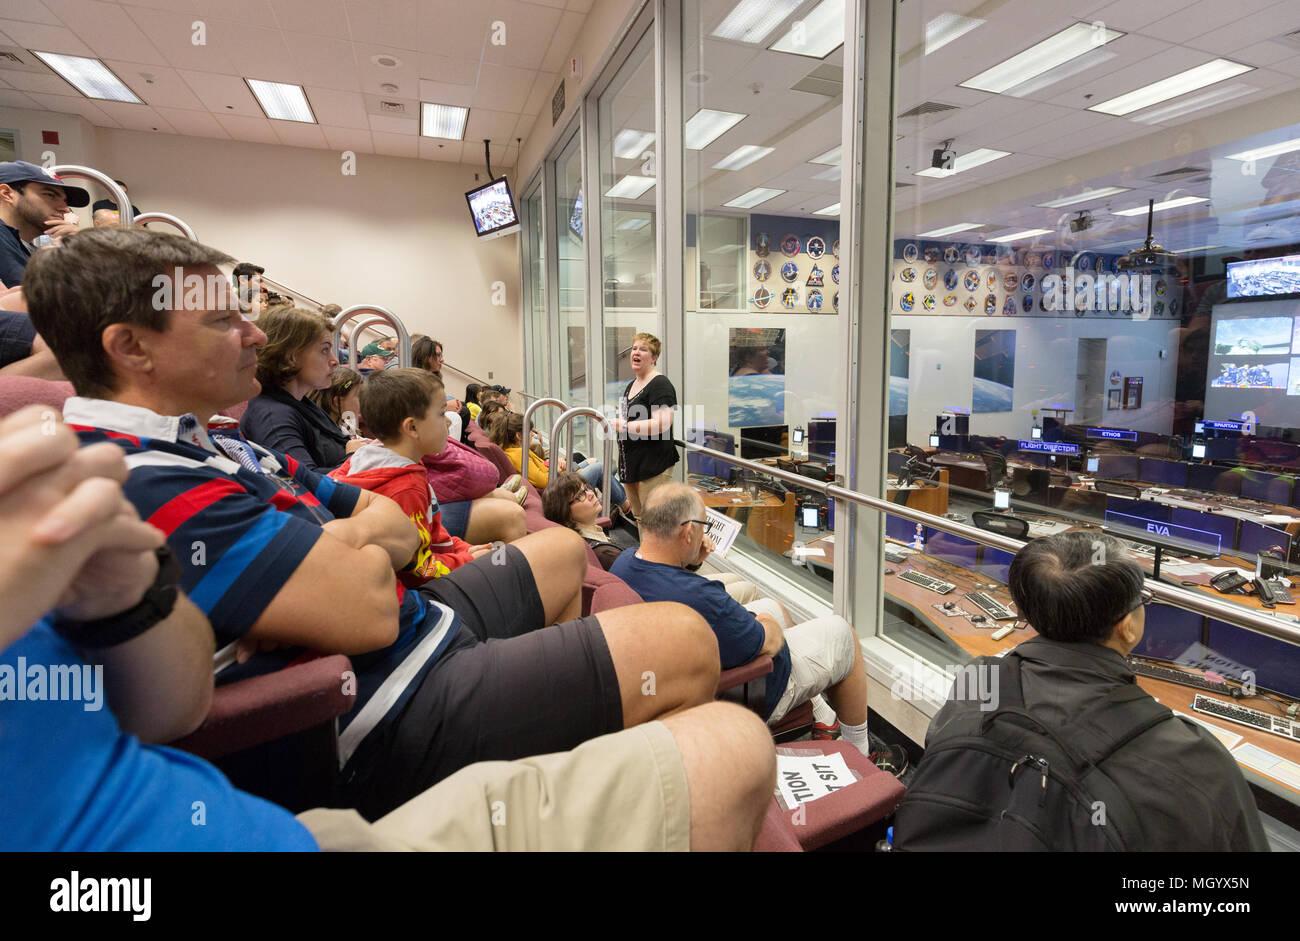 Visitors on a tour of Mission Control Center, NASA Johnson Space Center, Houston, Texas USA - Stock Image